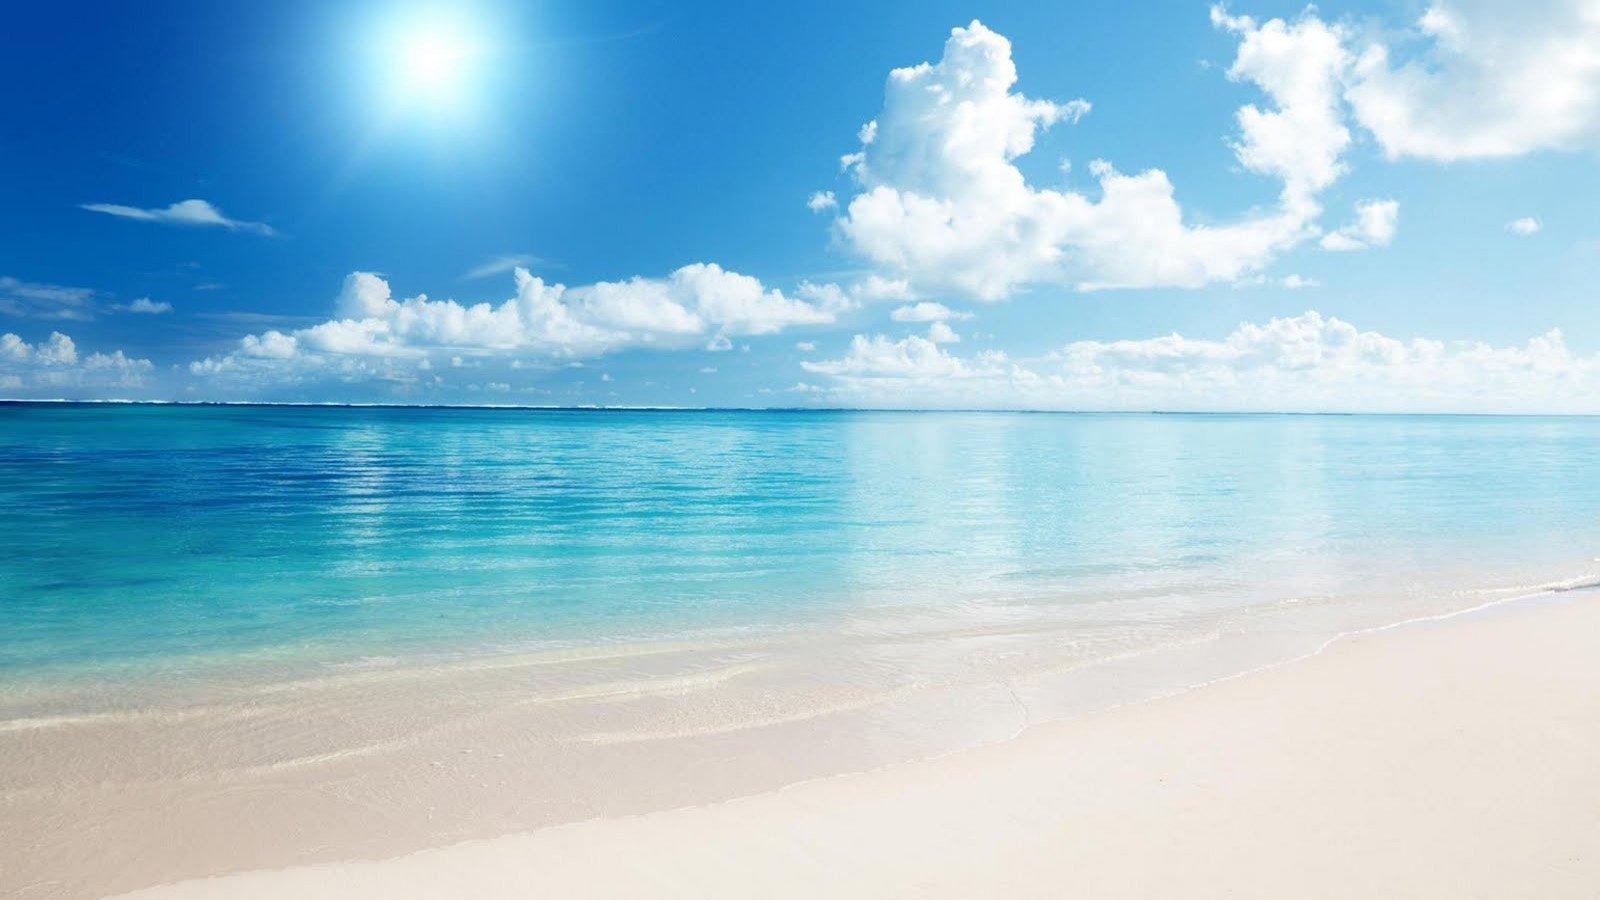 High Definition Wallpapers High: Hd Beach Wallpapers